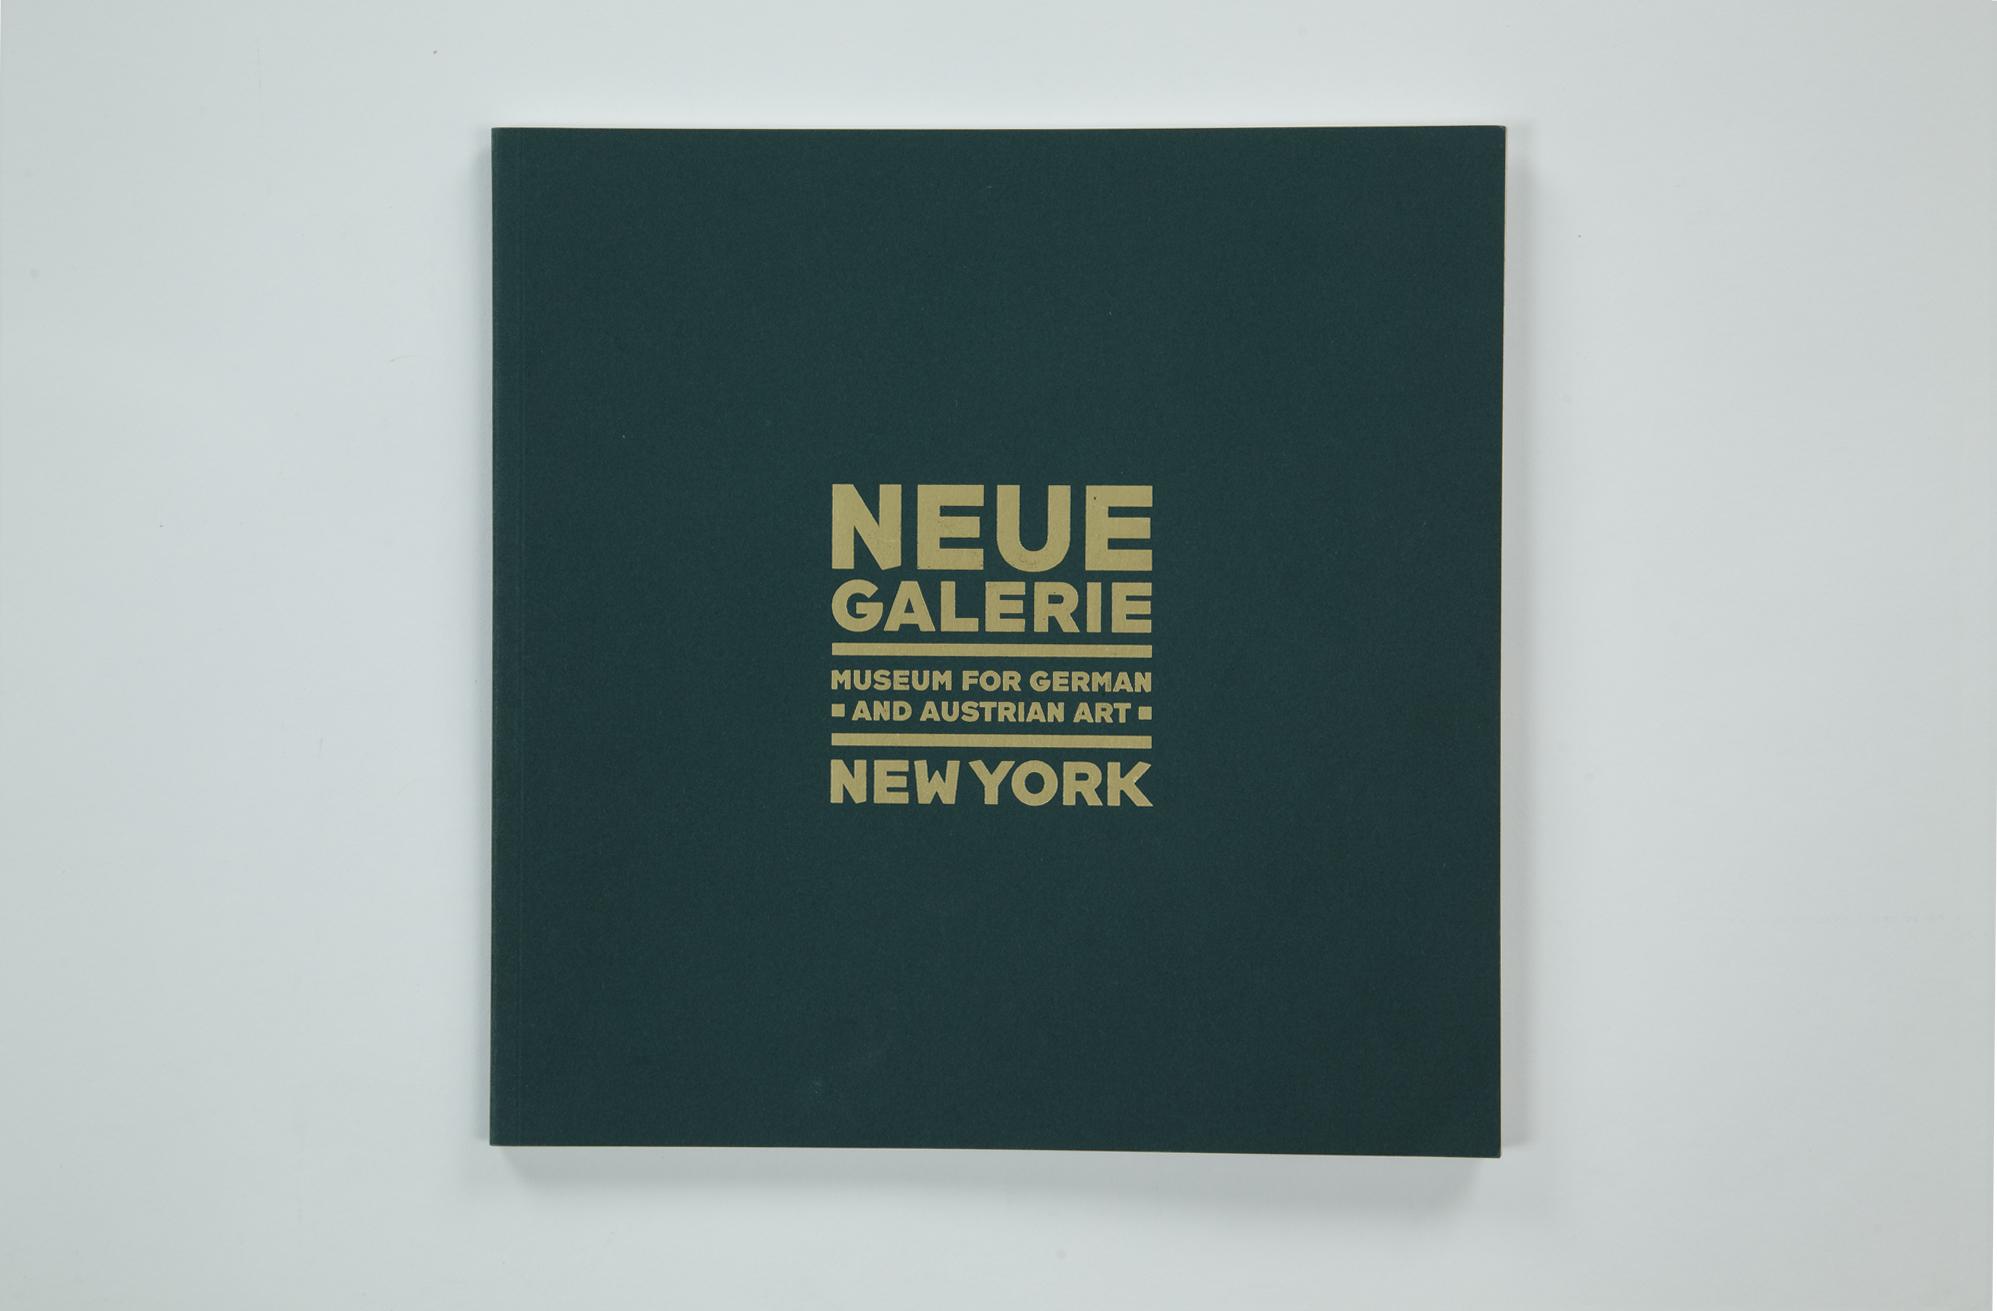 NG_RetailCover_Green.jpg